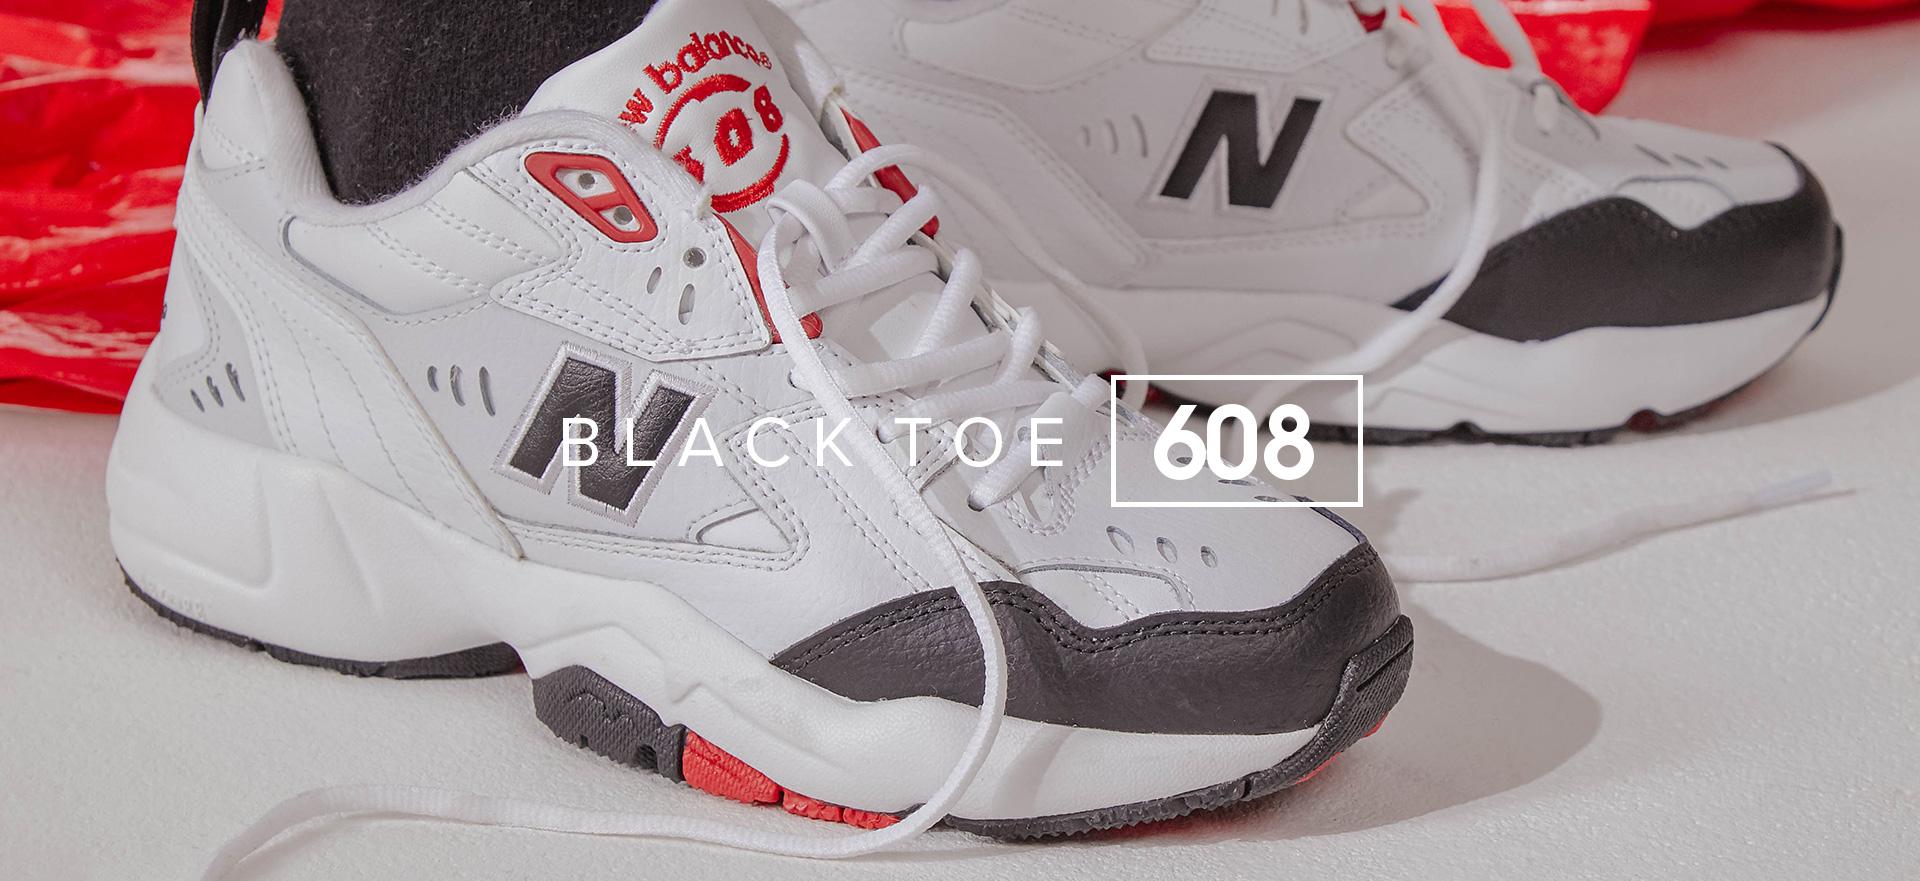 BLACKTOE 608